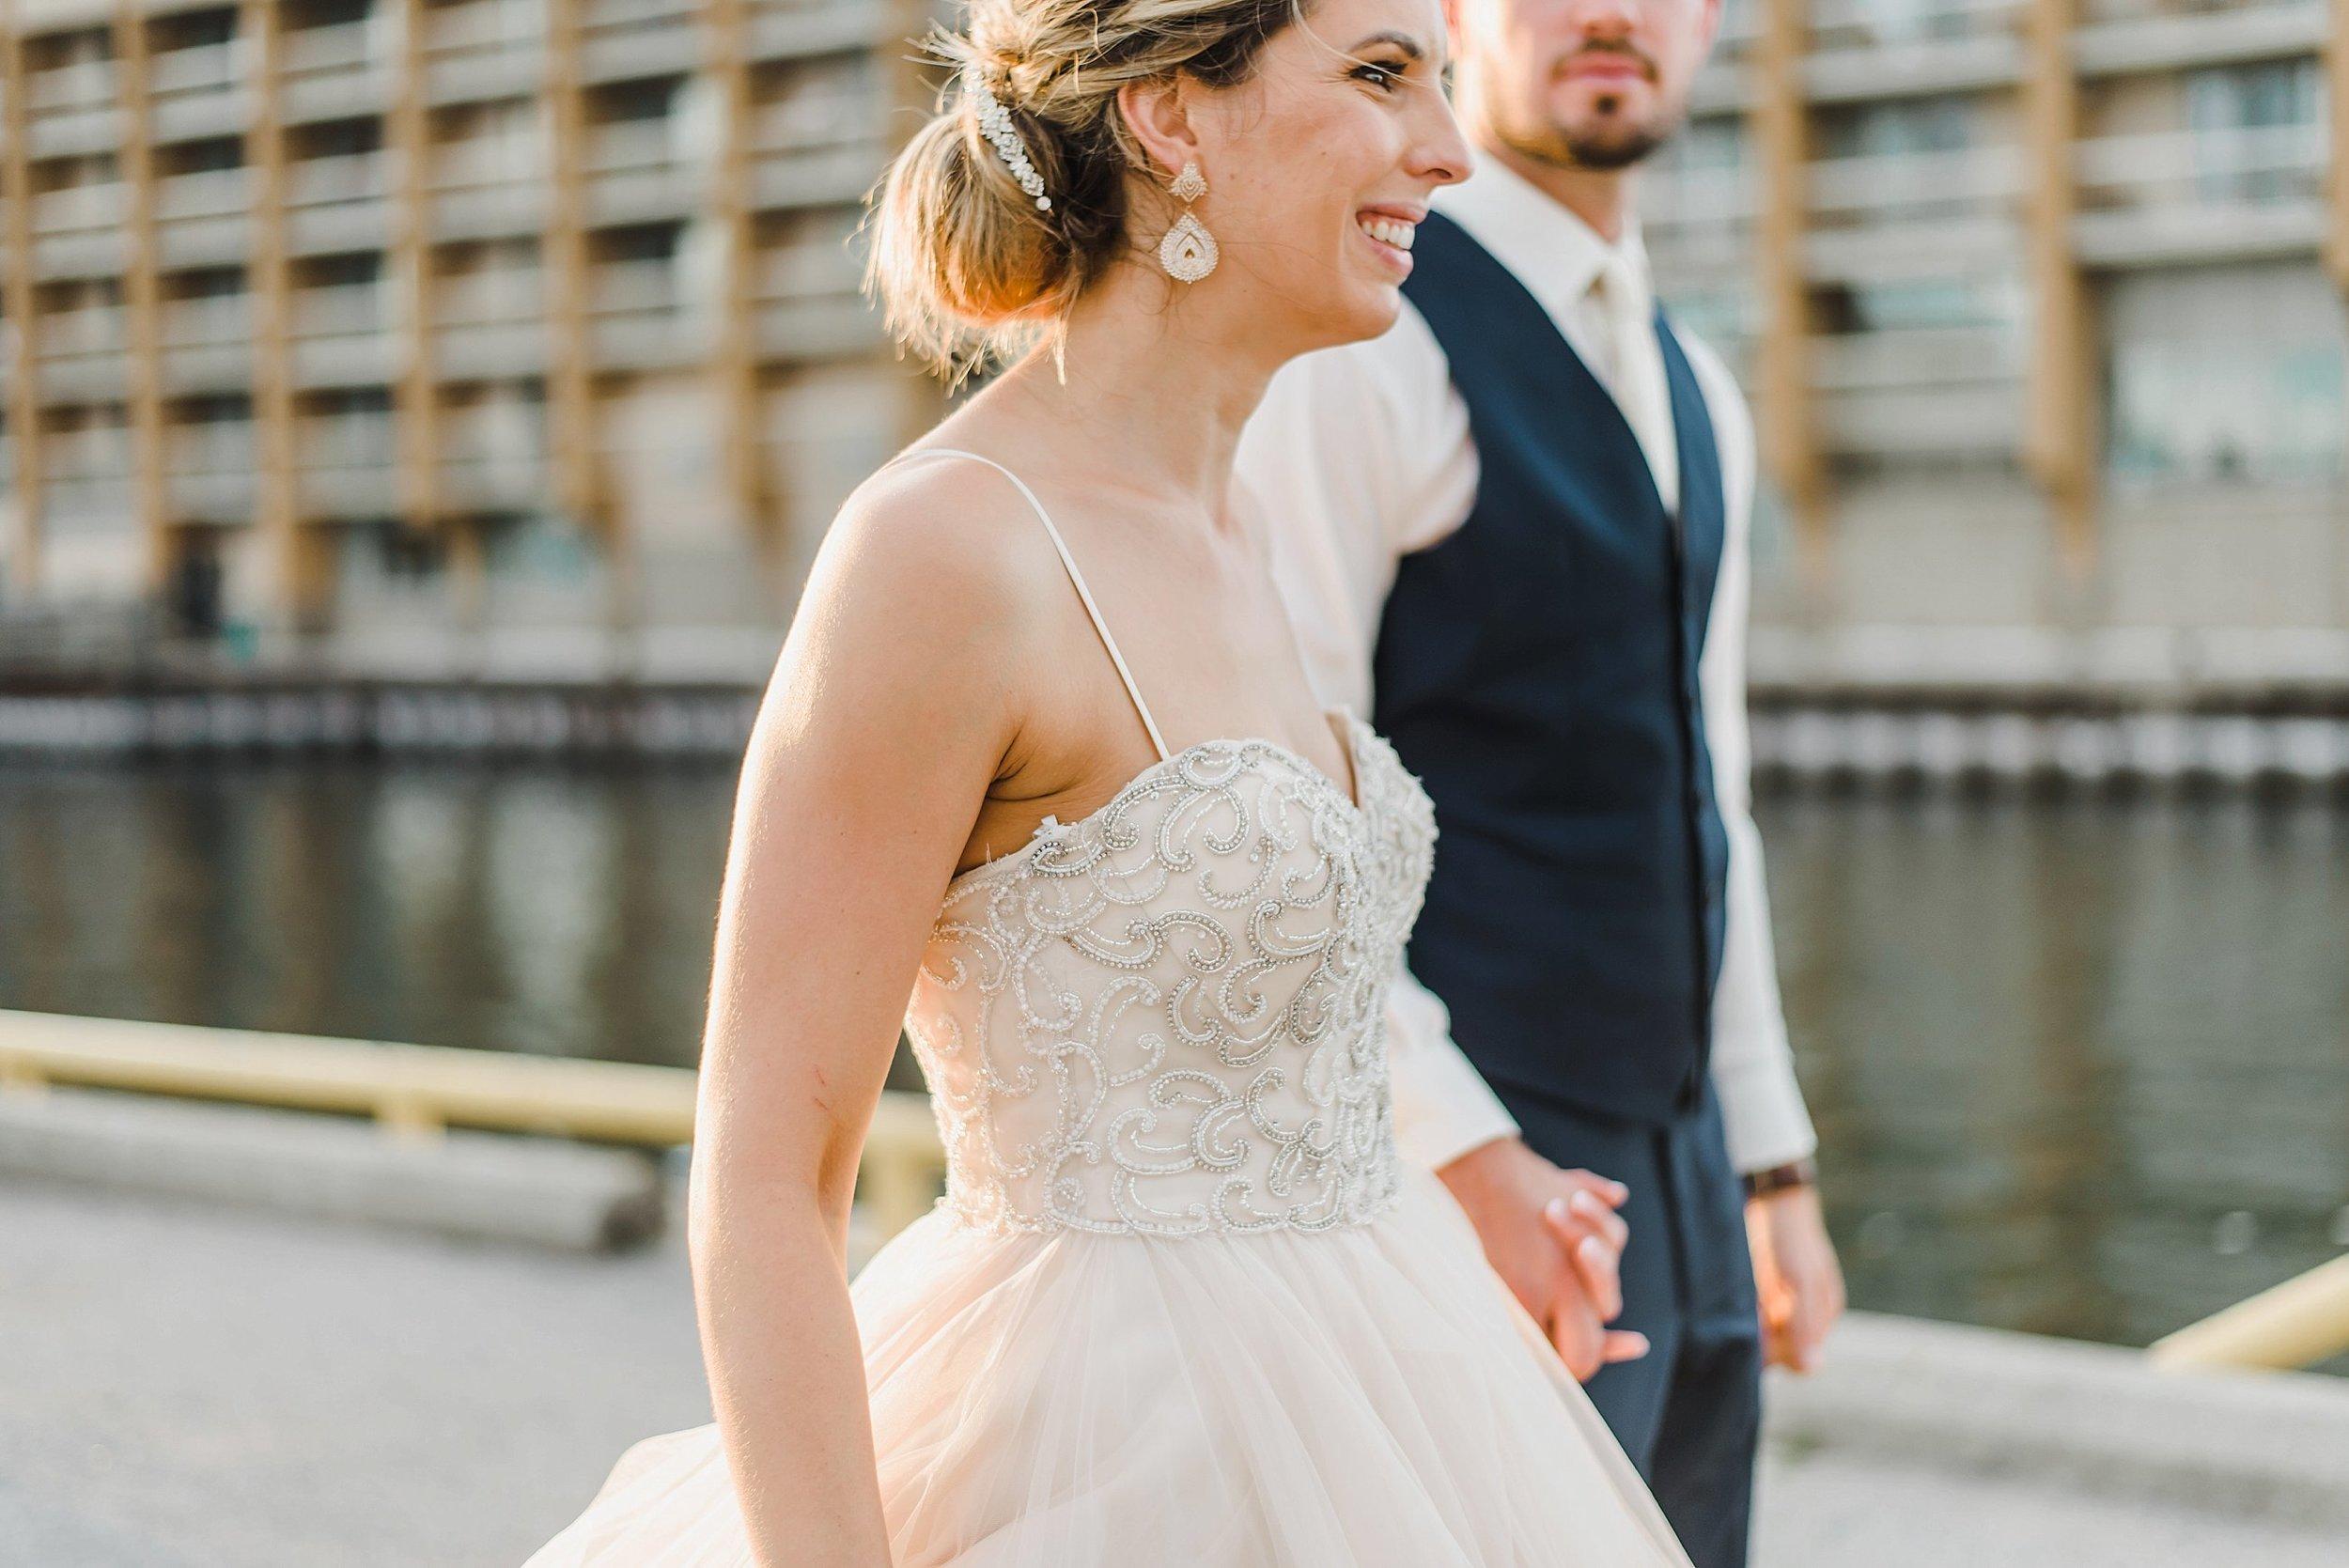 light airy indie fine art ottawa wedding photographer | Ali and Batoul Photography_0238.jpg